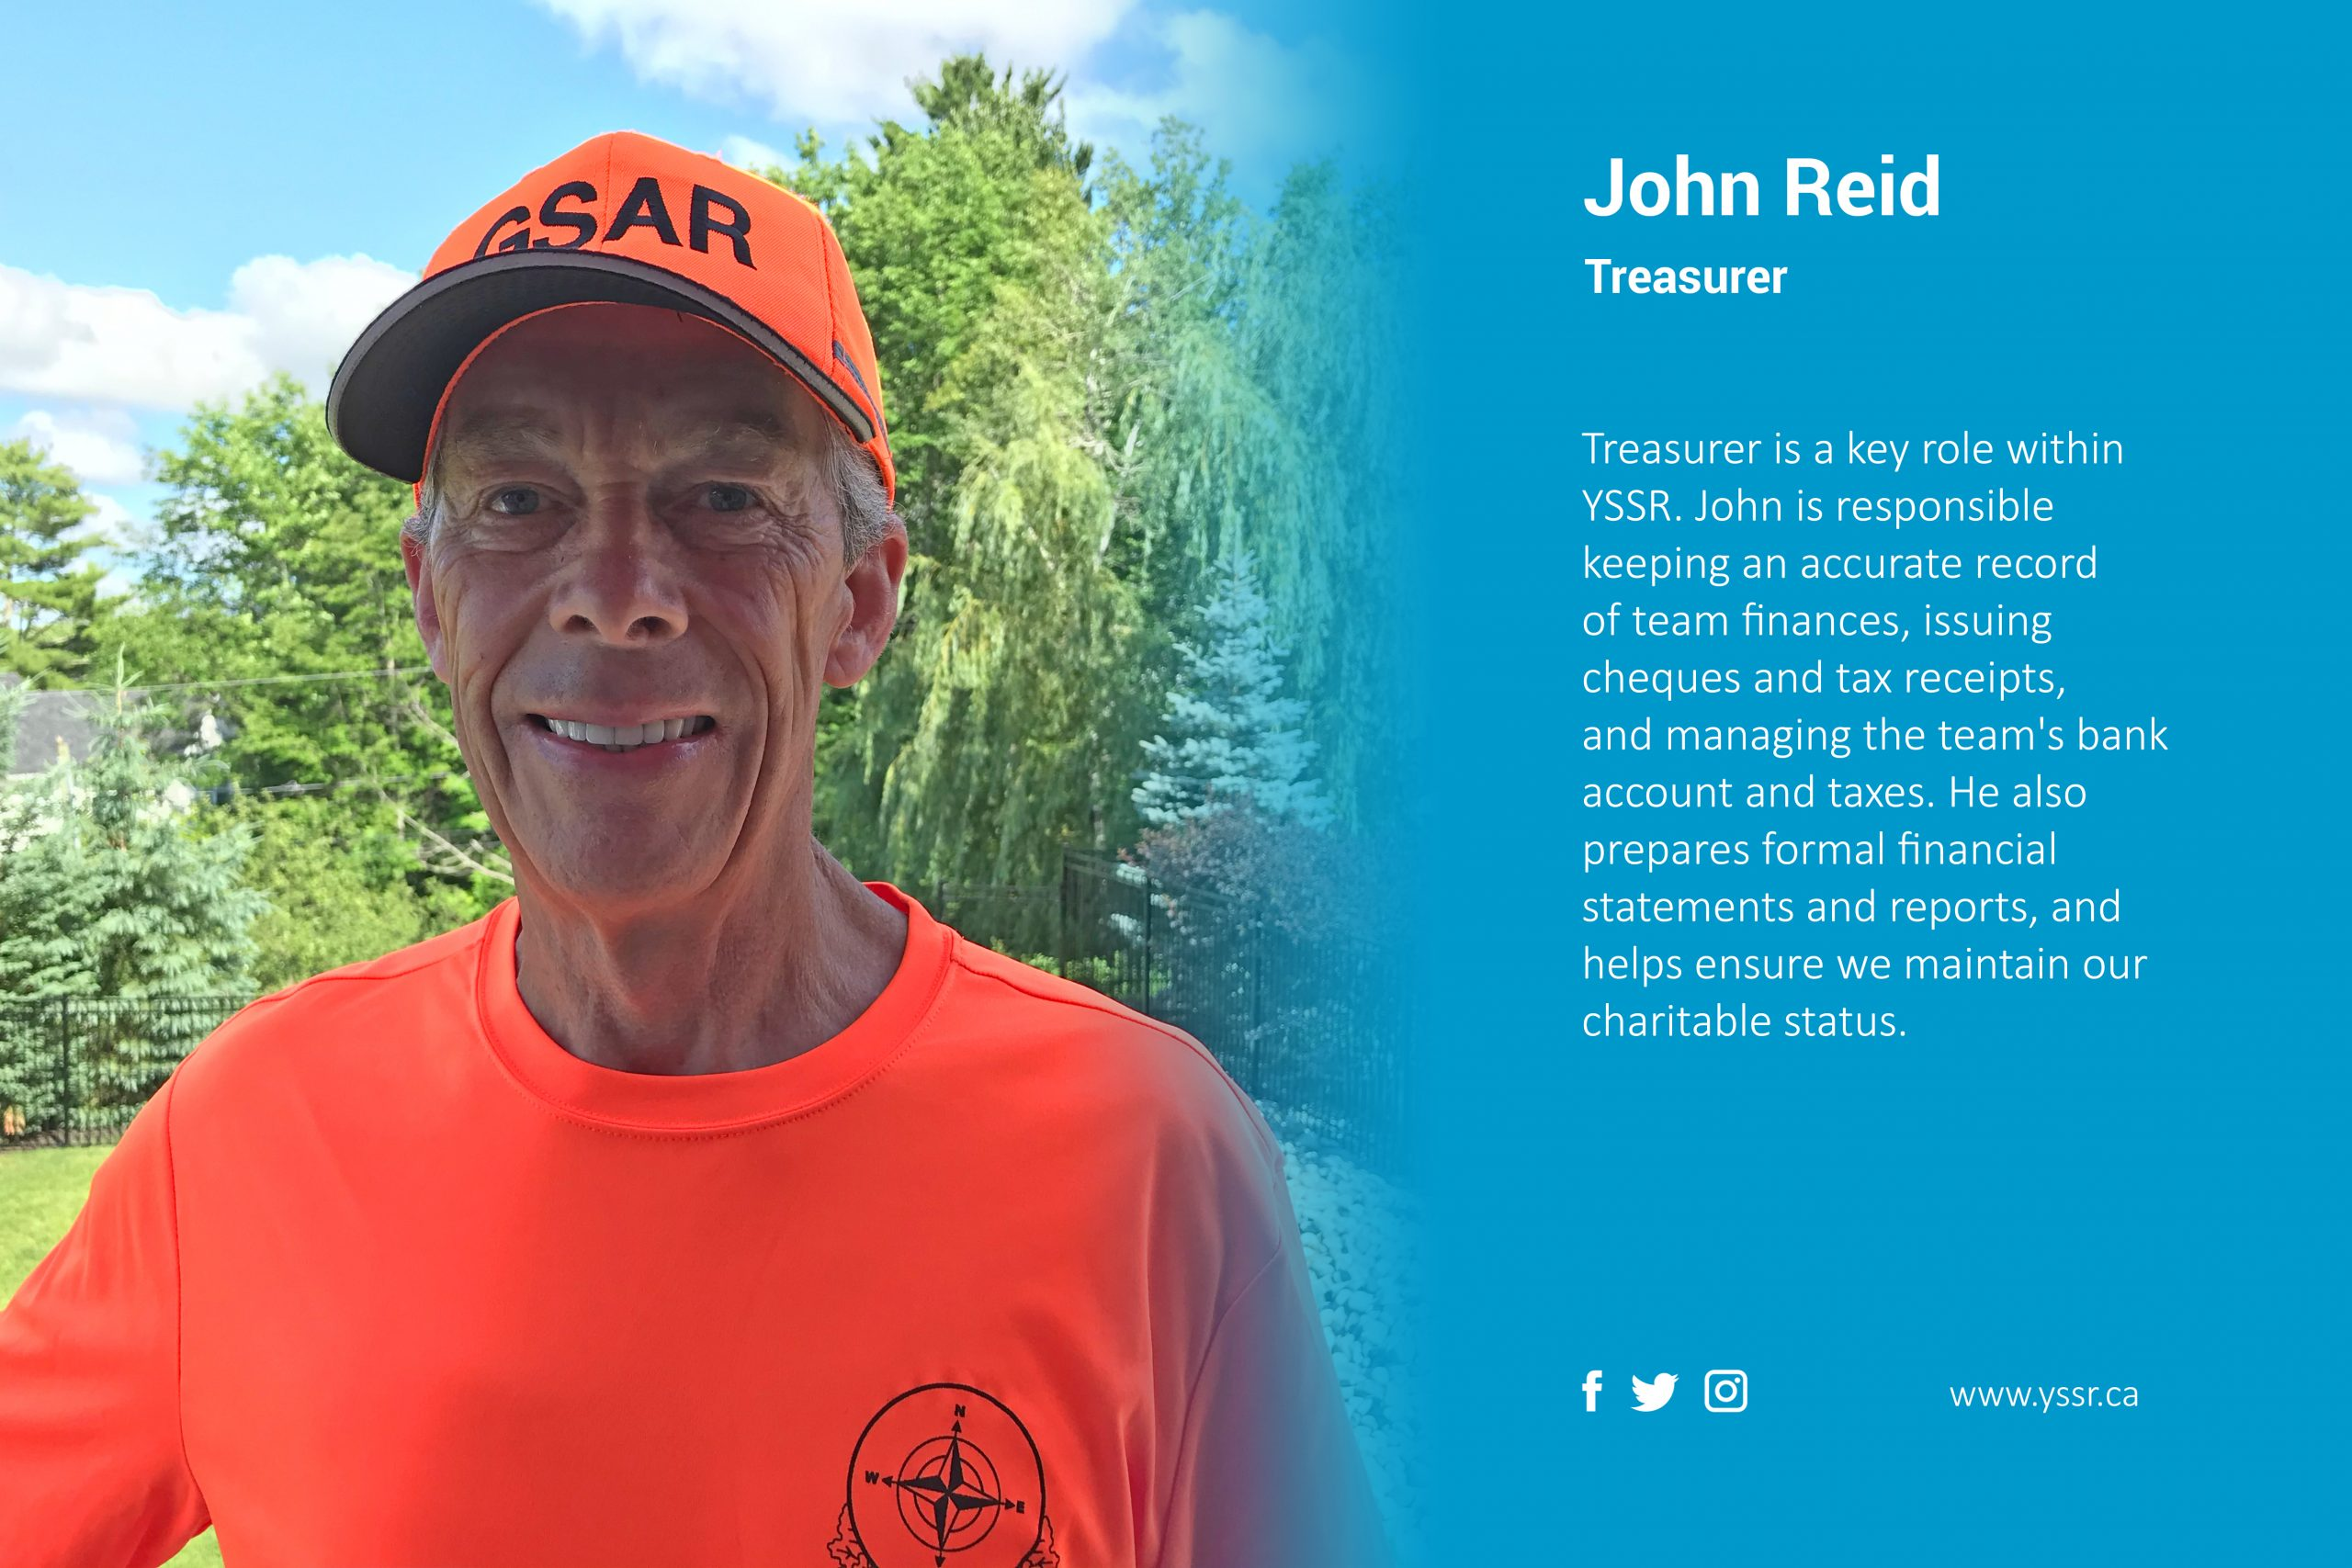 Treasurer John Reid highlight